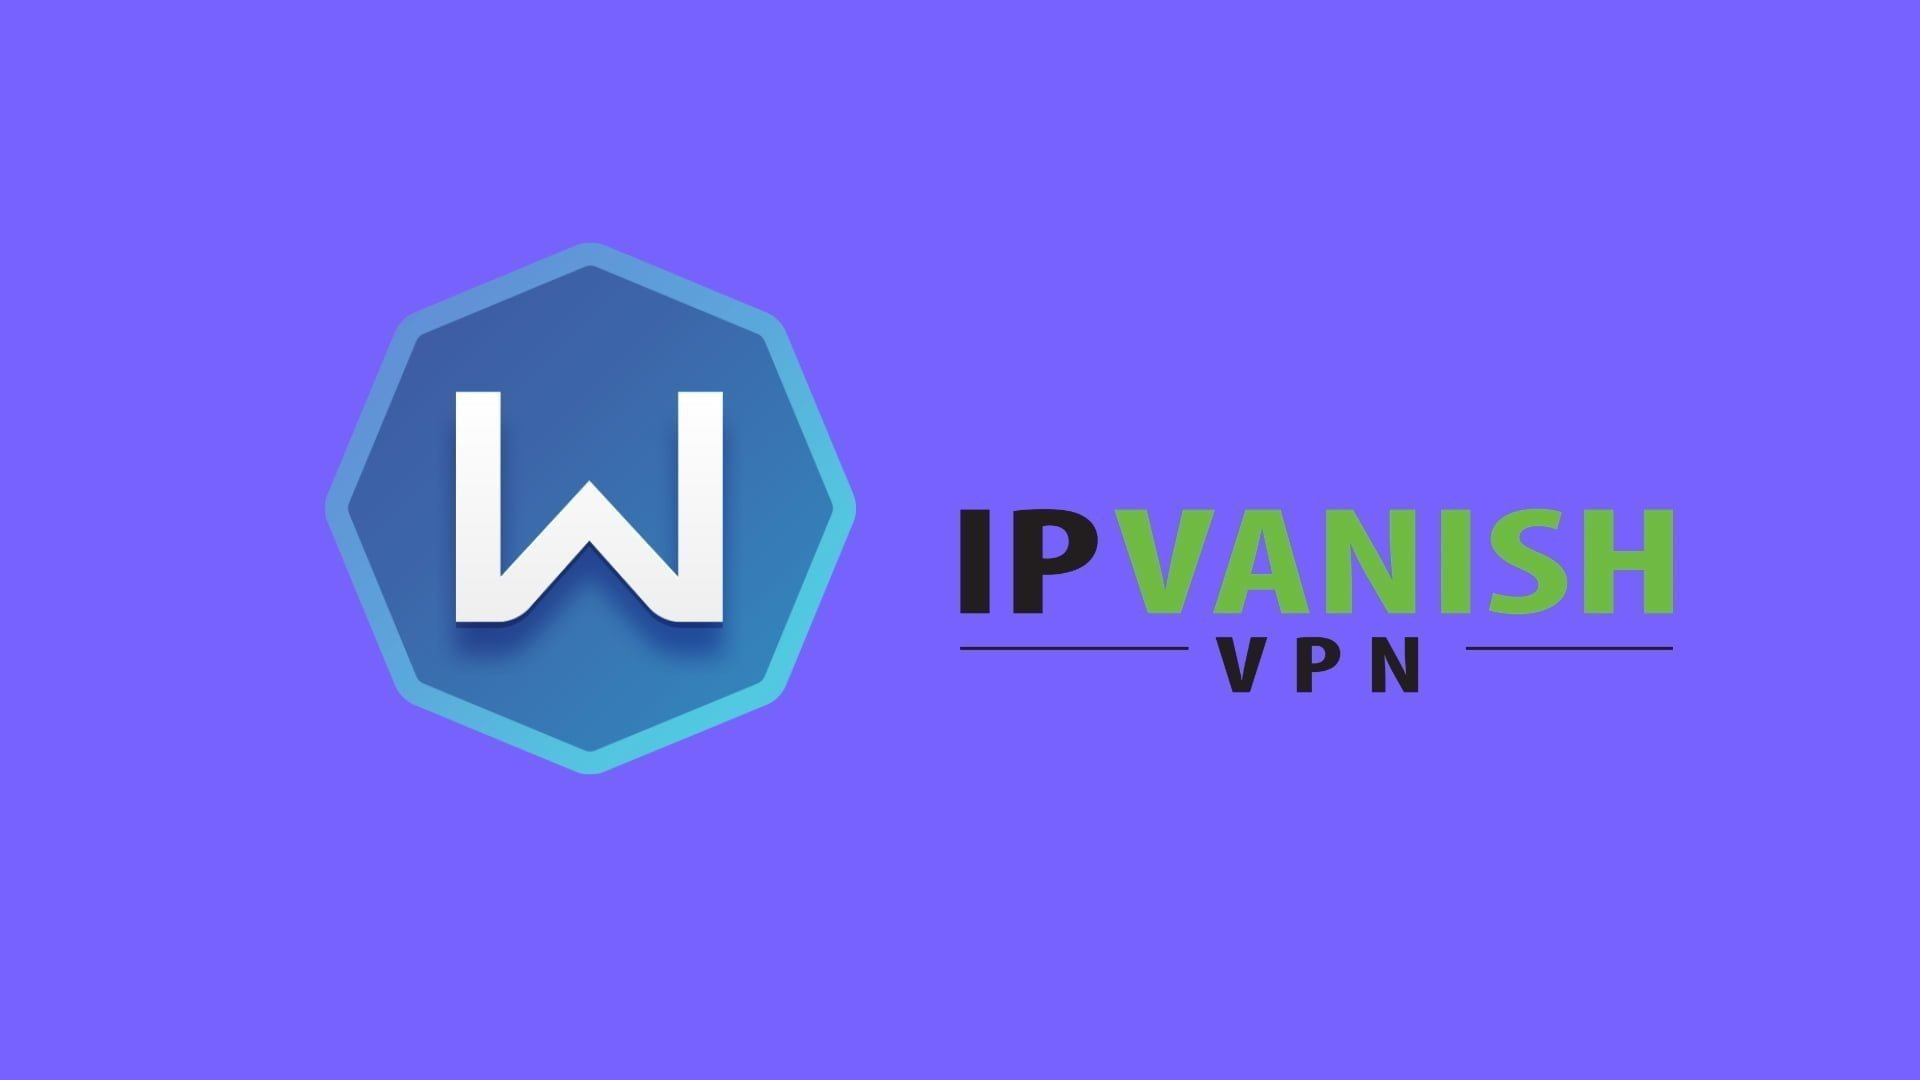 Vergleich: Windscribe vs. IPVanish techboys.de • smarte News, auf den Punkt!